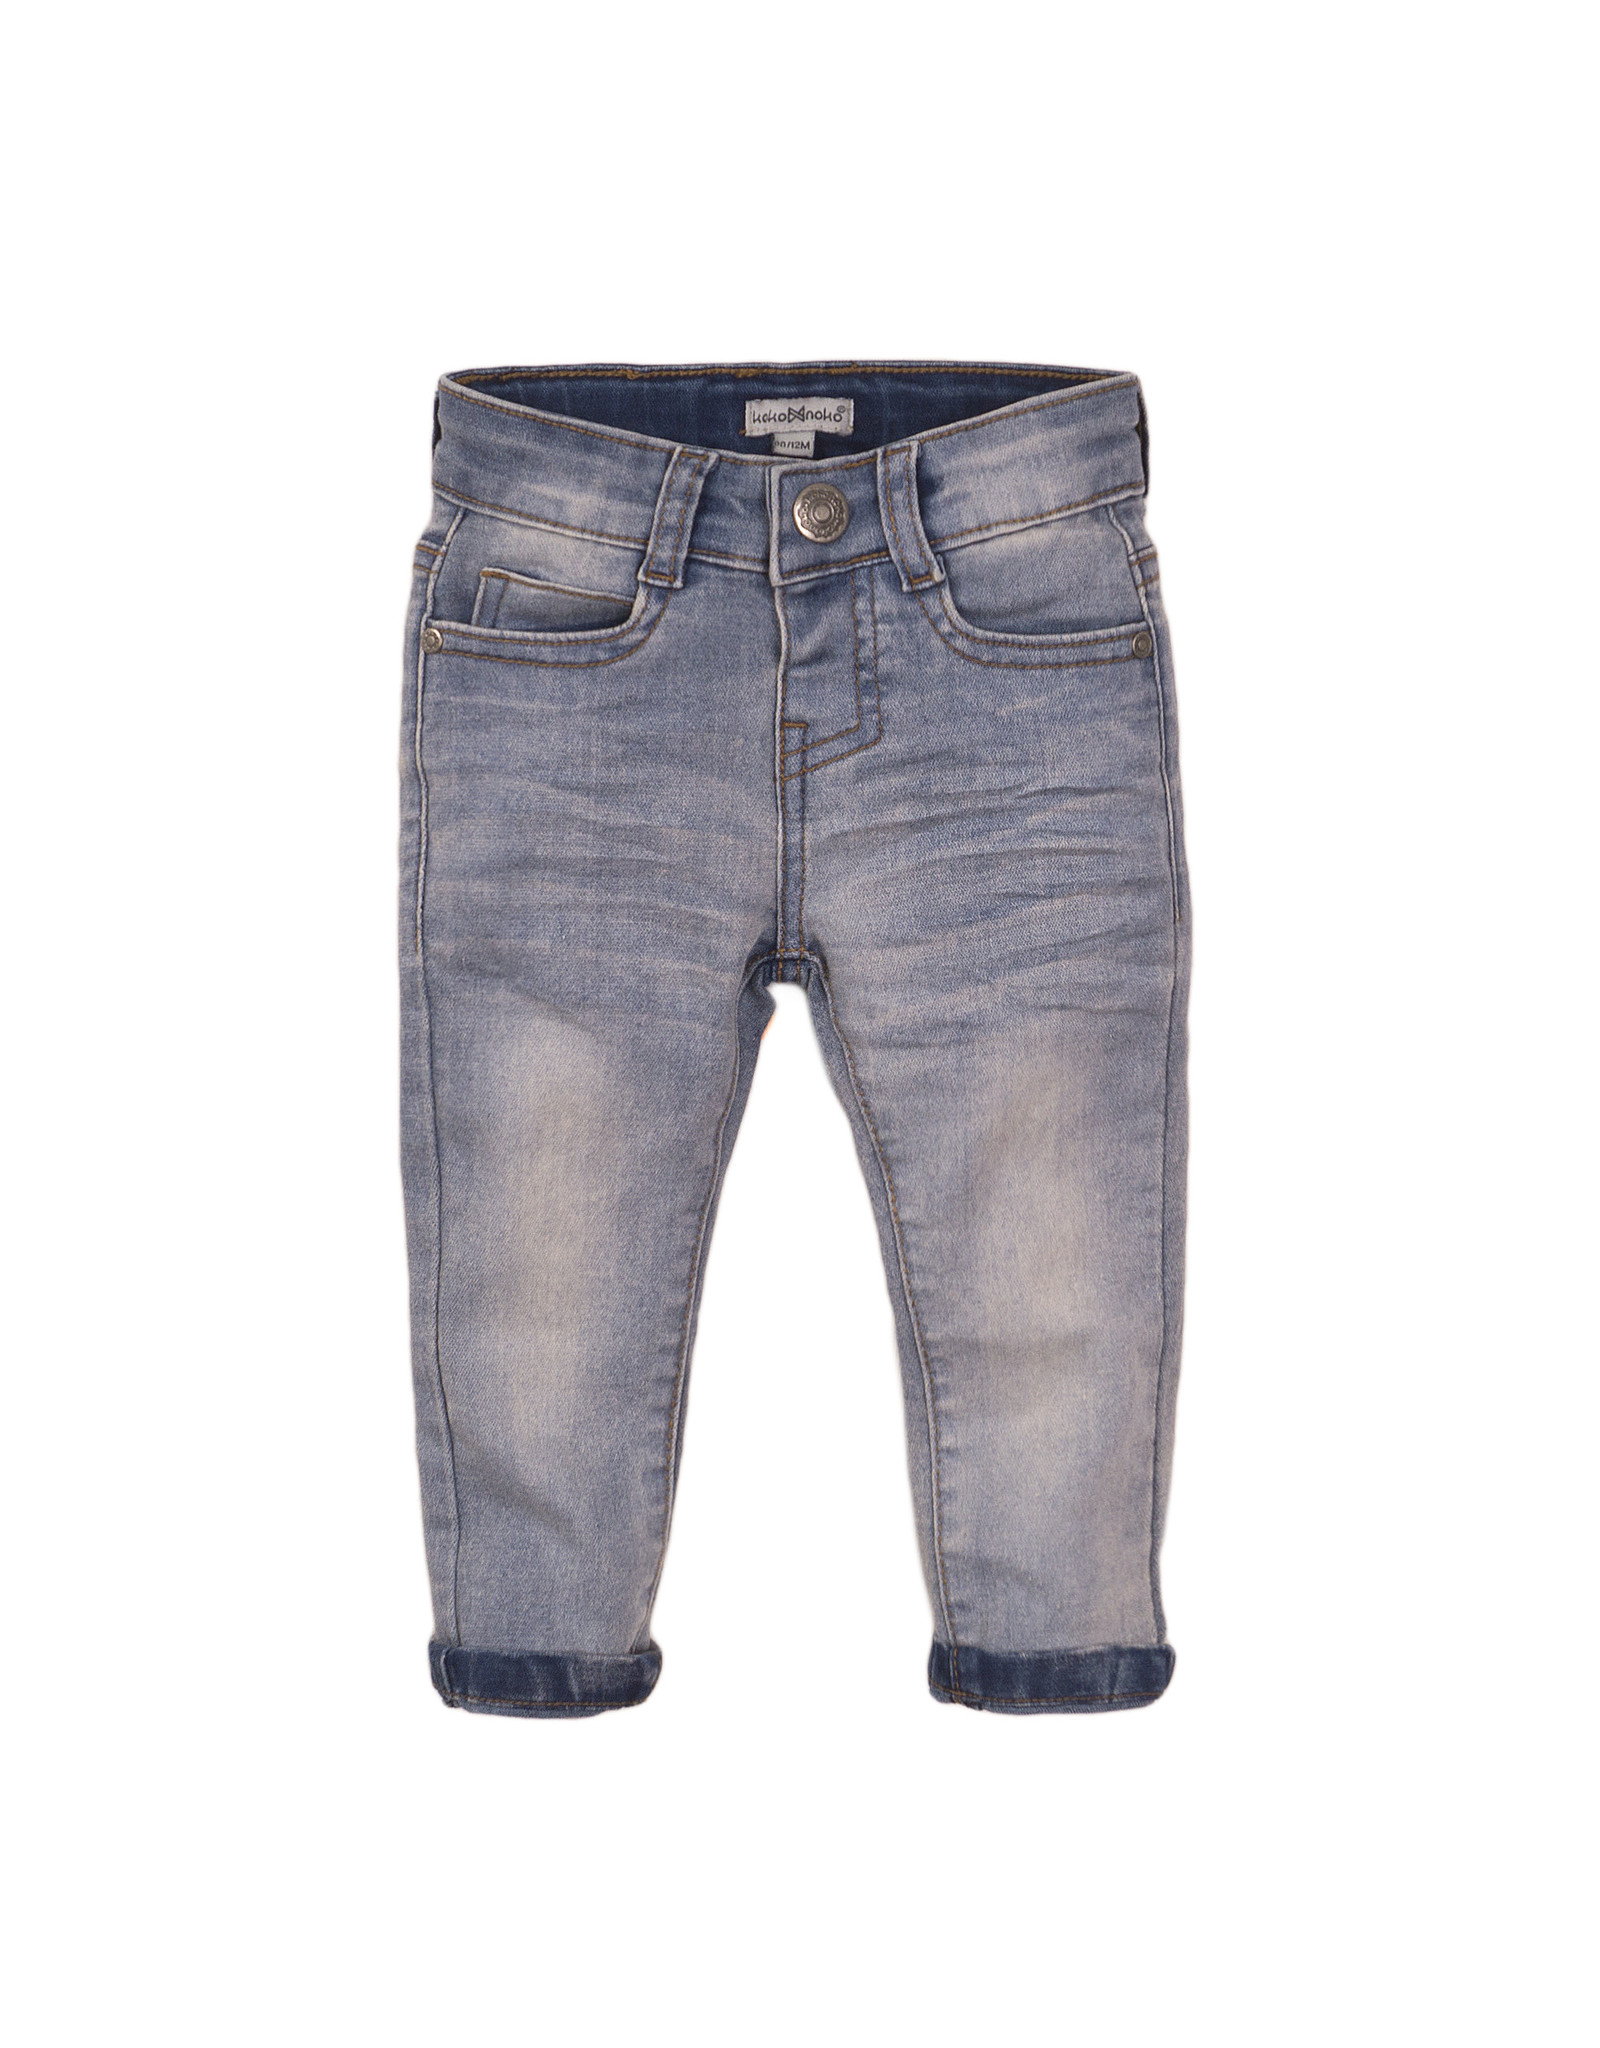 Koko Noko Boys jeans Blue jeans